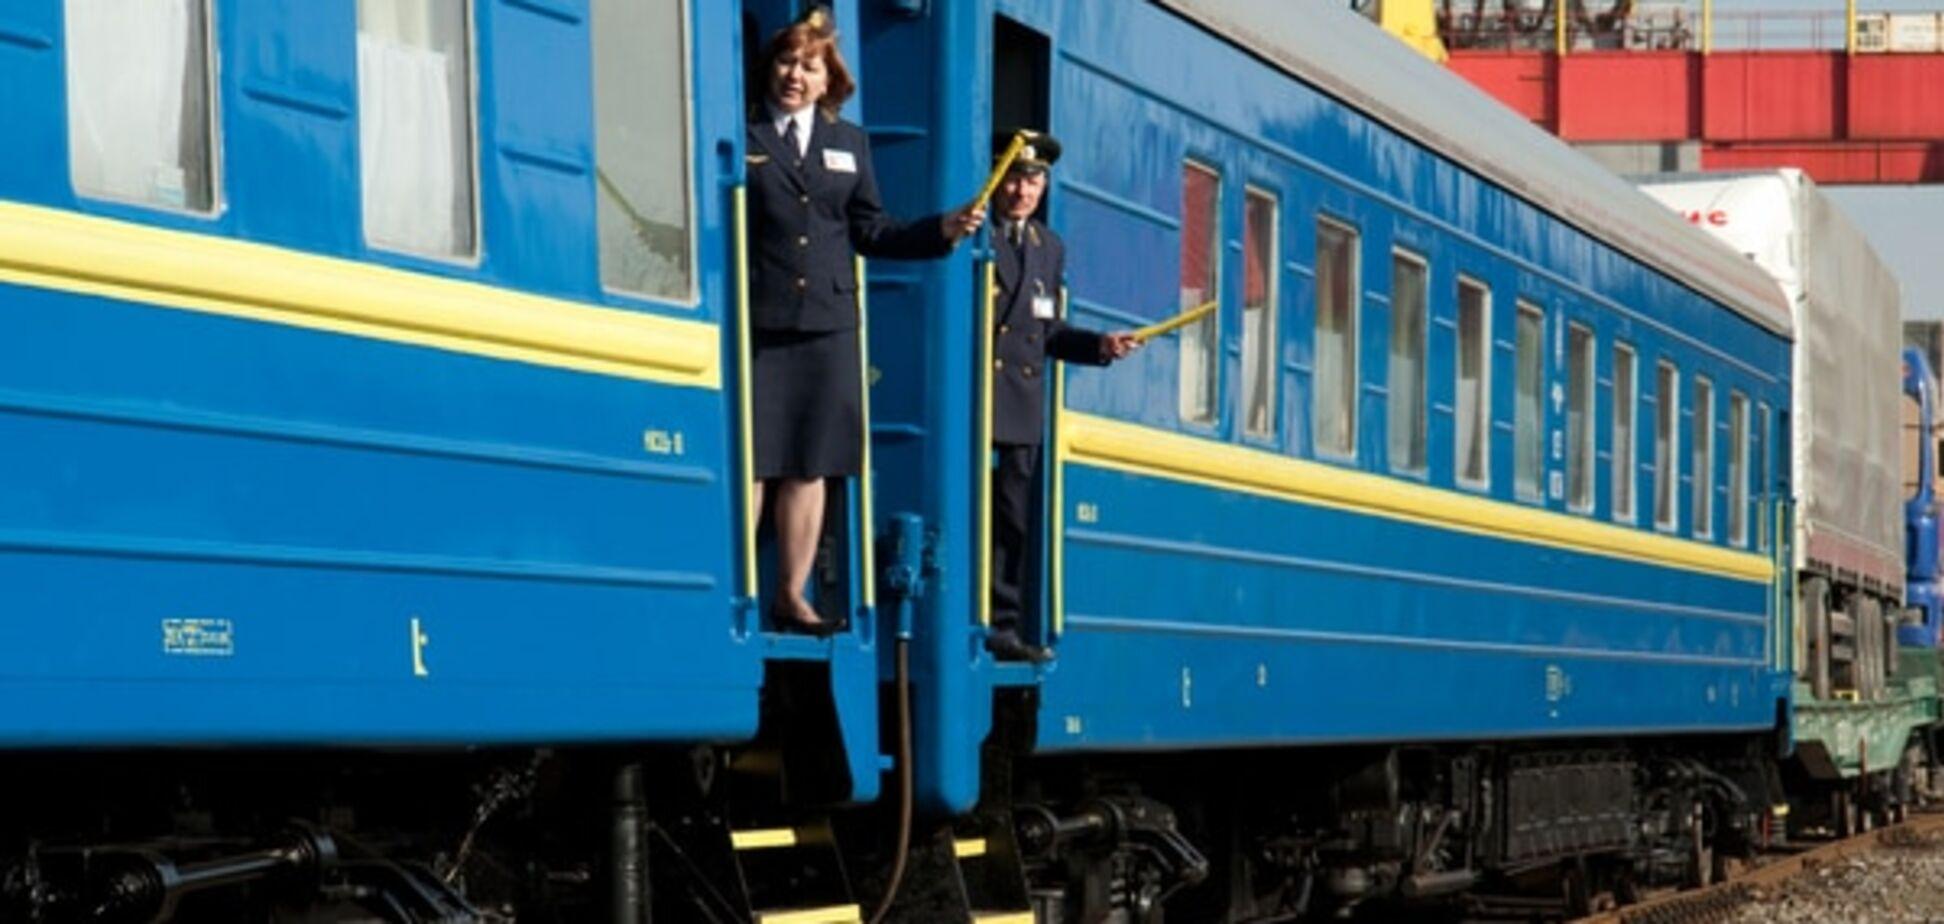 Подарок украинцам: 'Укрзалізниця' проявила невиданную щедрость